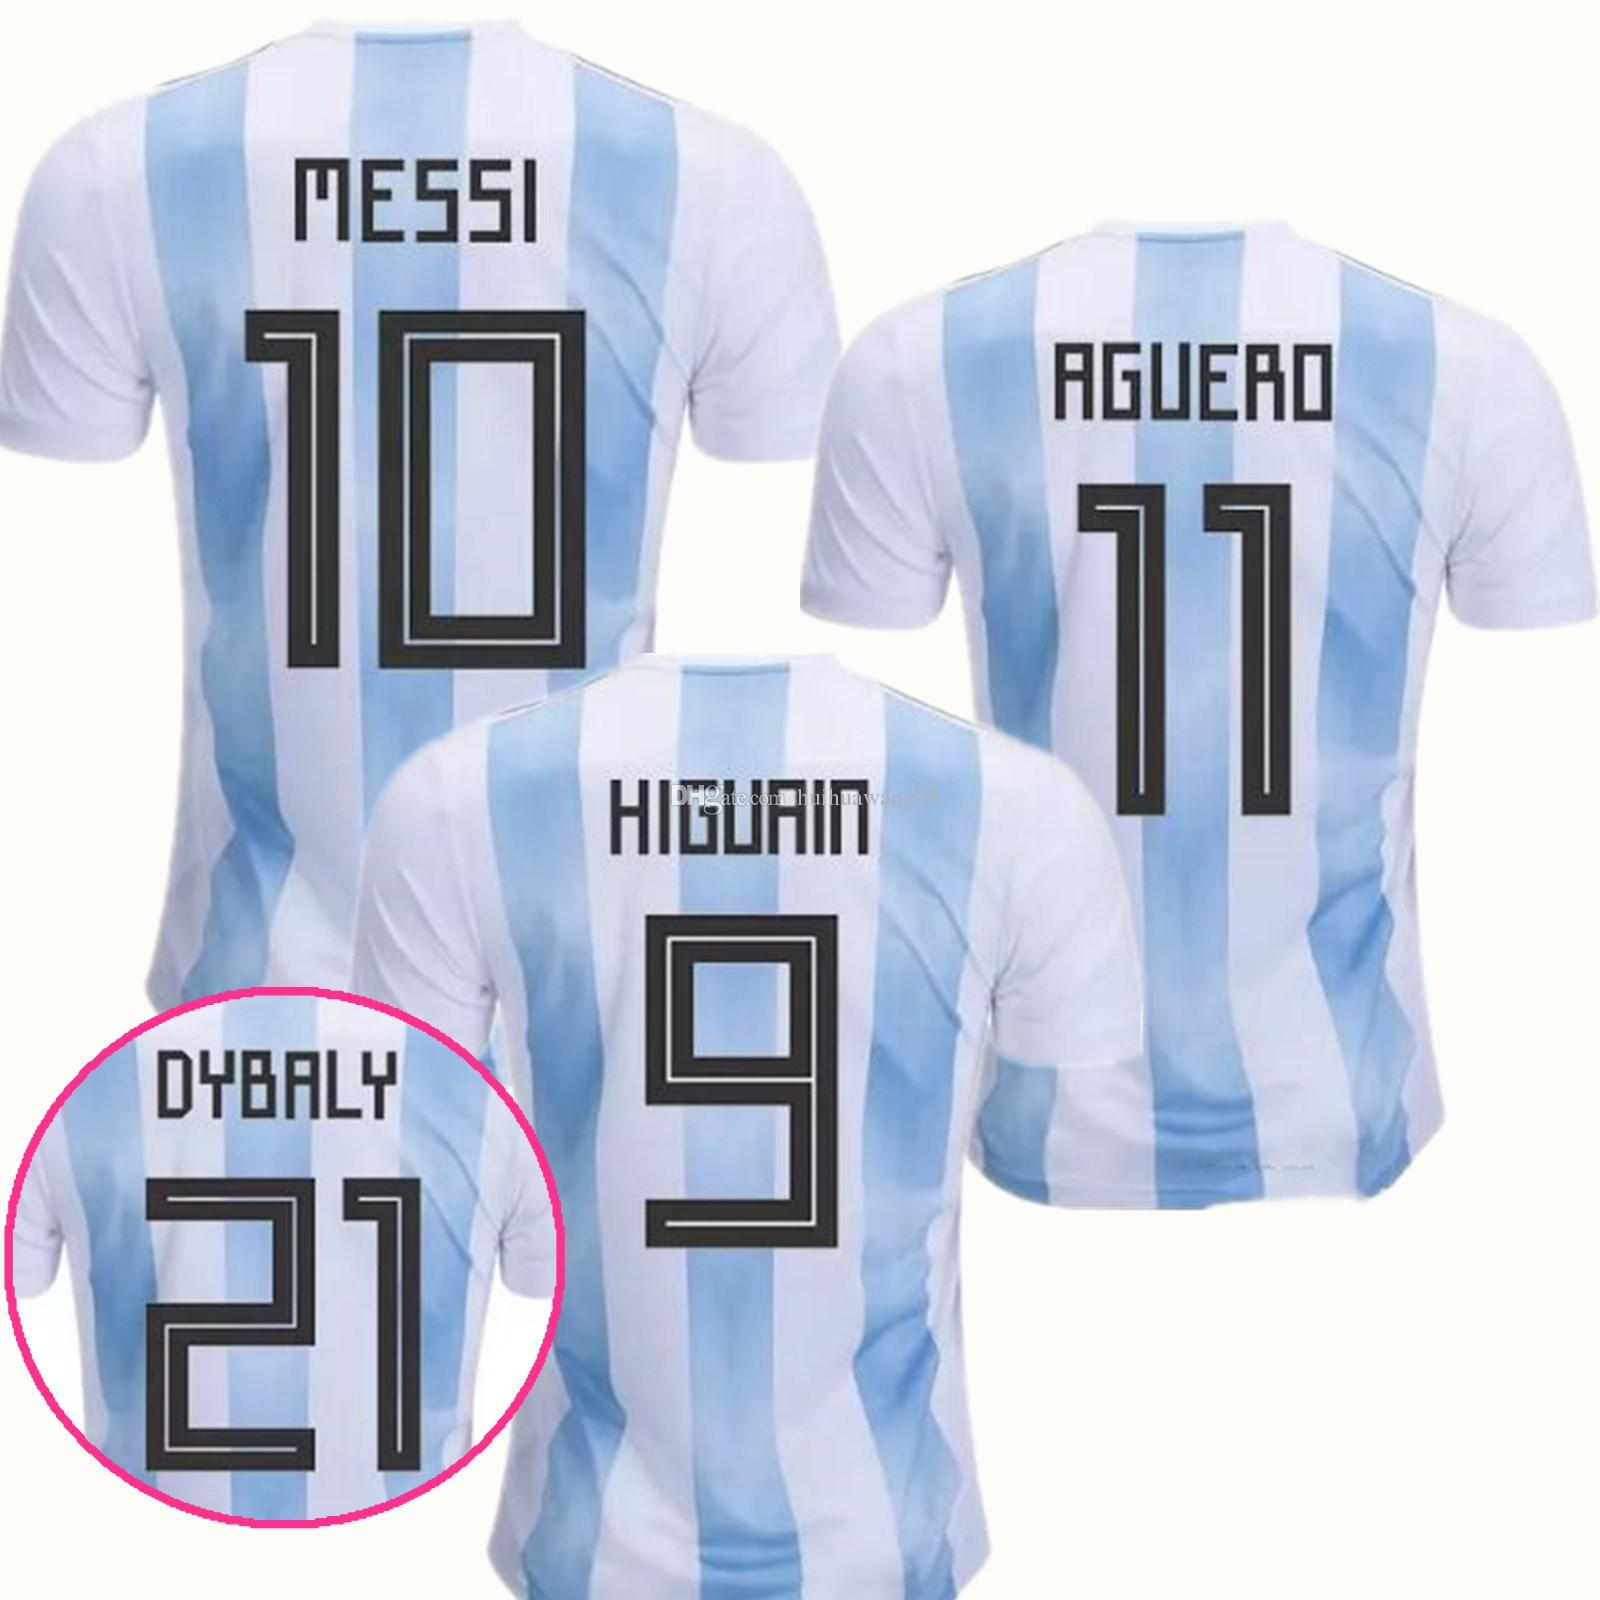 c61fef589 2018 Argentina World Cup Soccer Jerseys MESSI DI MARIA AGUERO ...